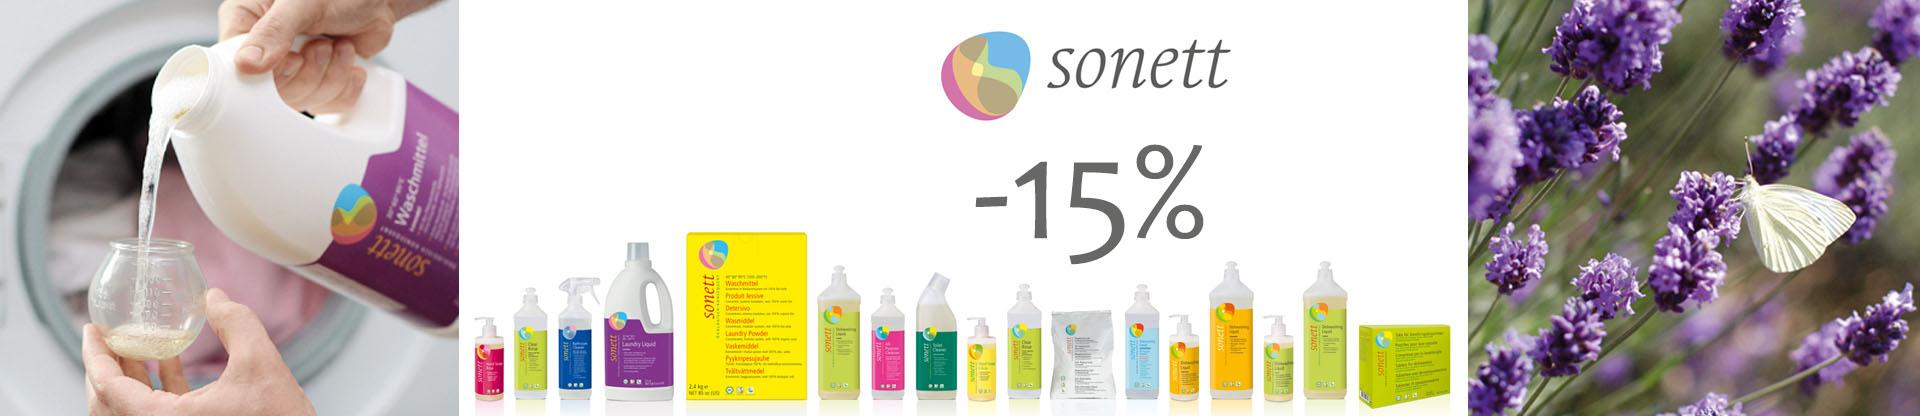 Осенью дешевле! Sonett -15%